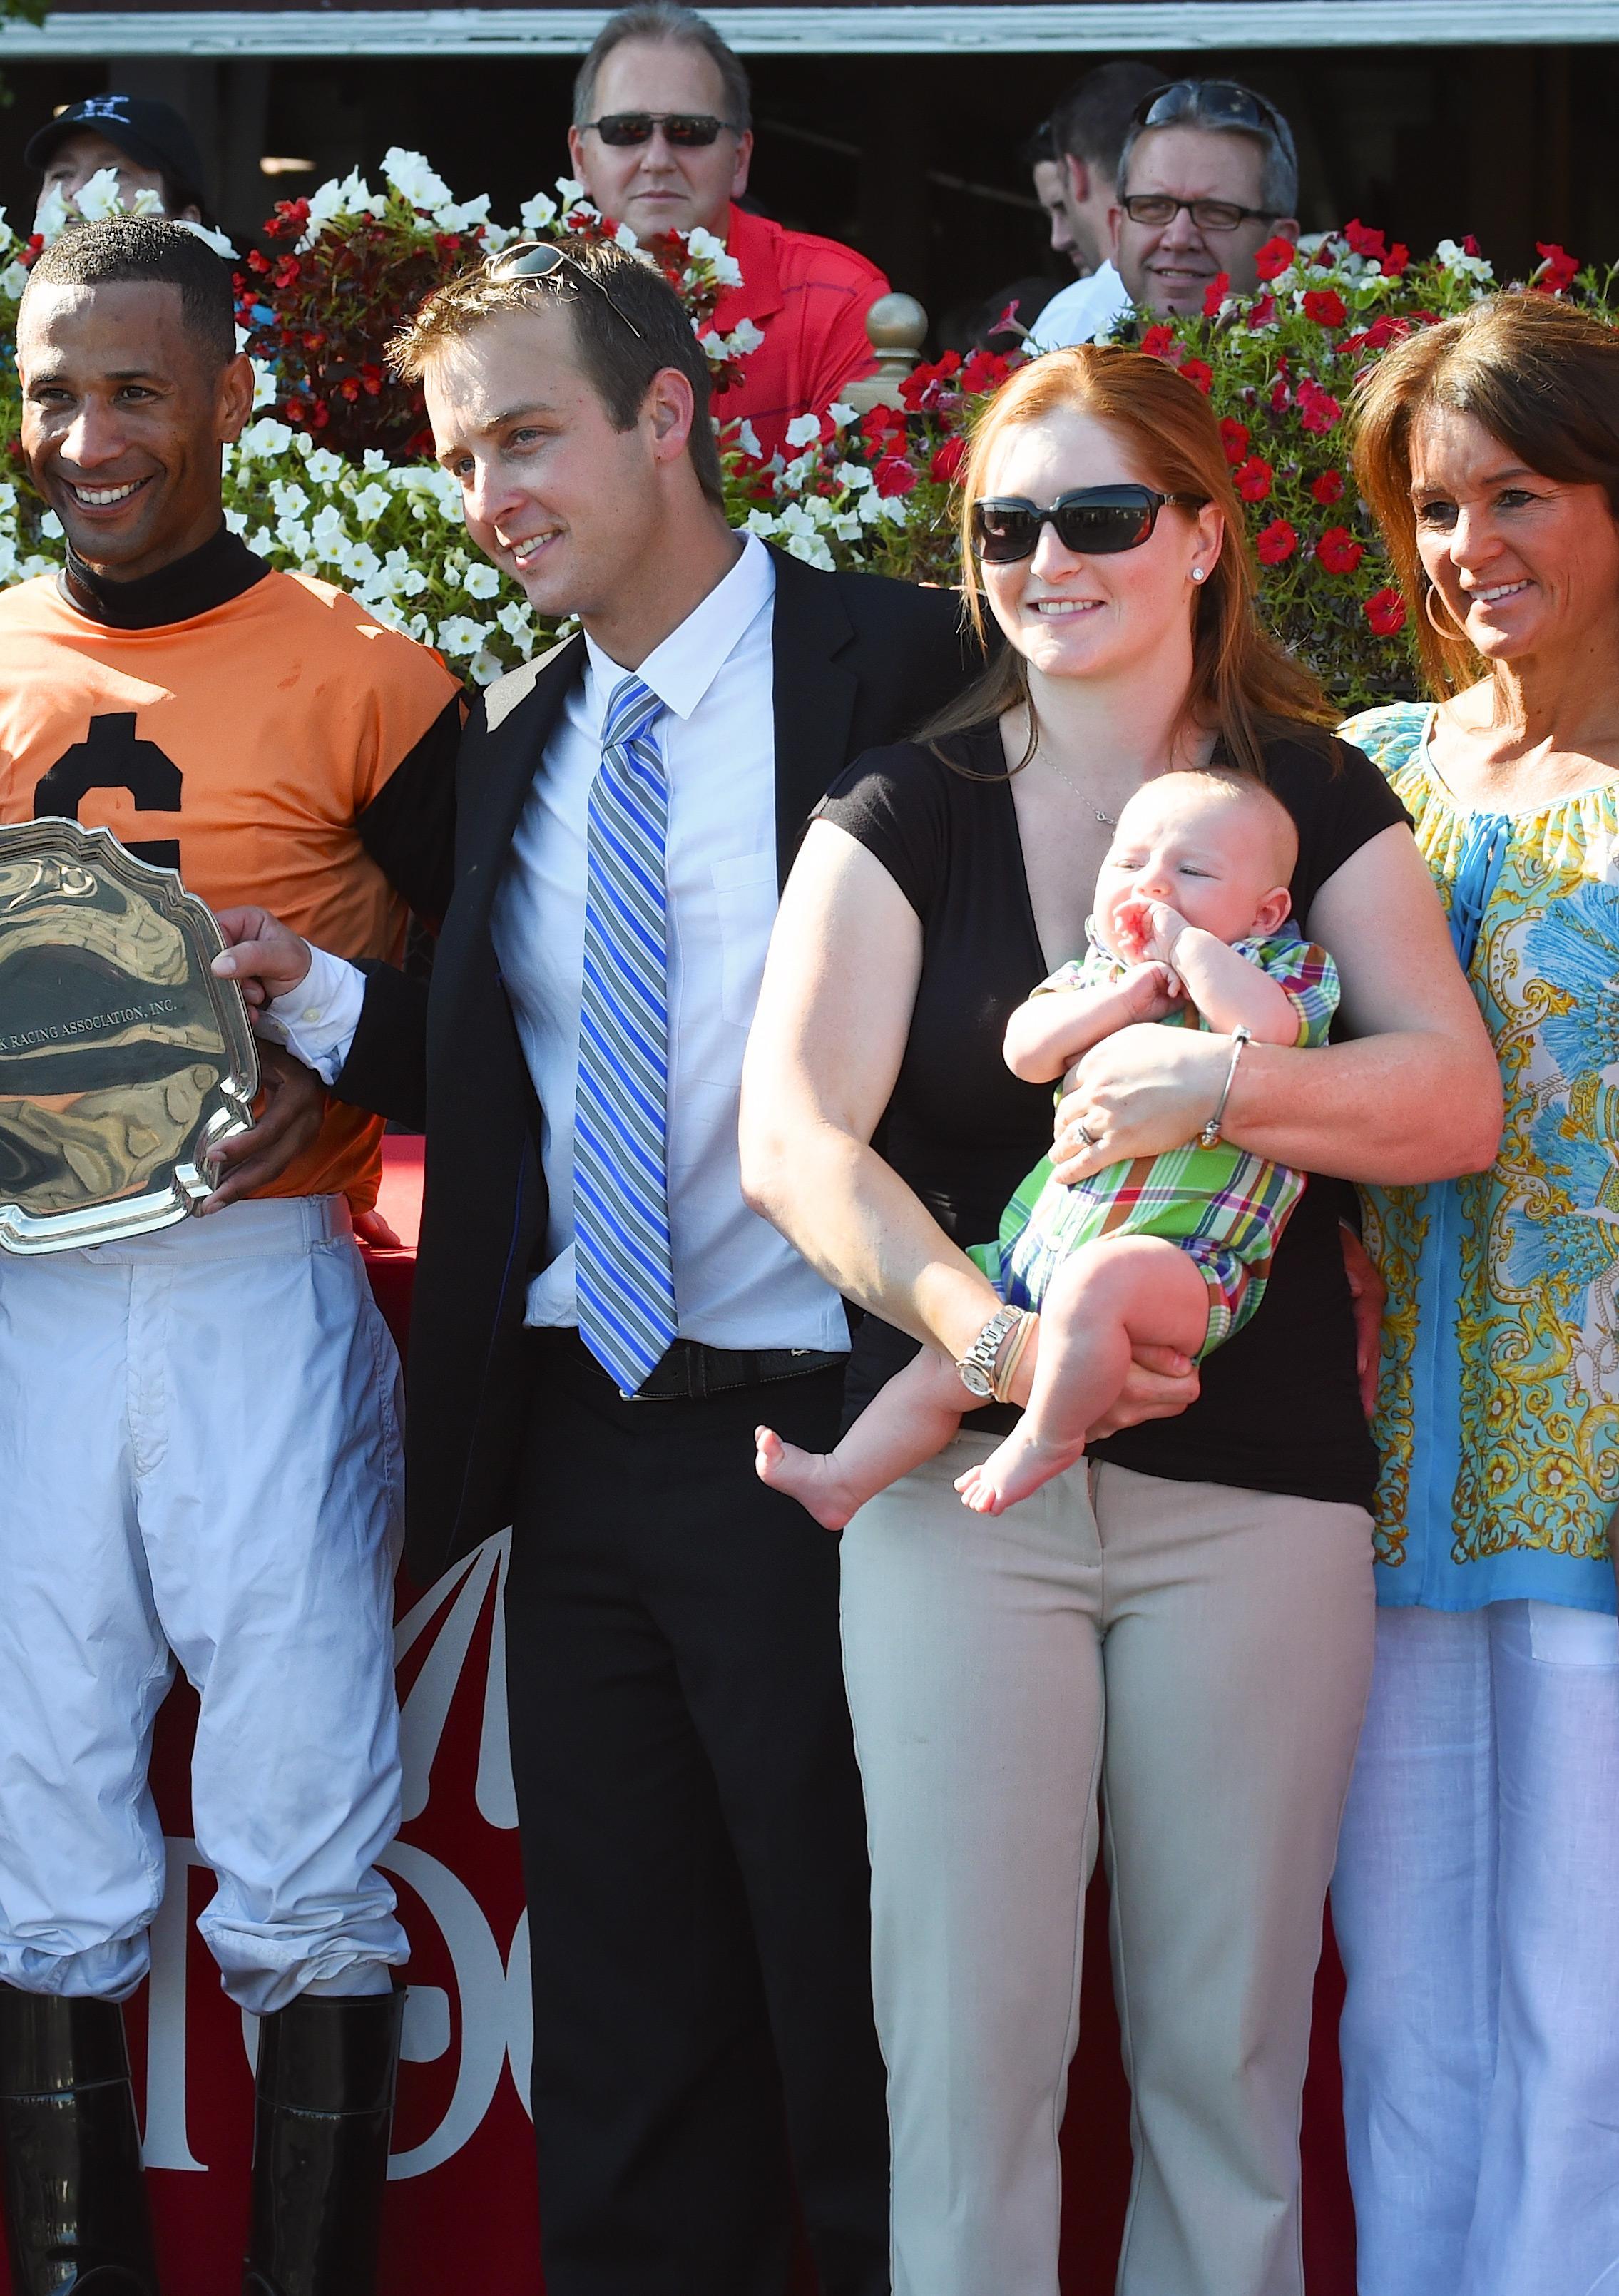 Rosie Napravnik, husband Joe Sharp, and son Carson in the Saratoga winner's circle.